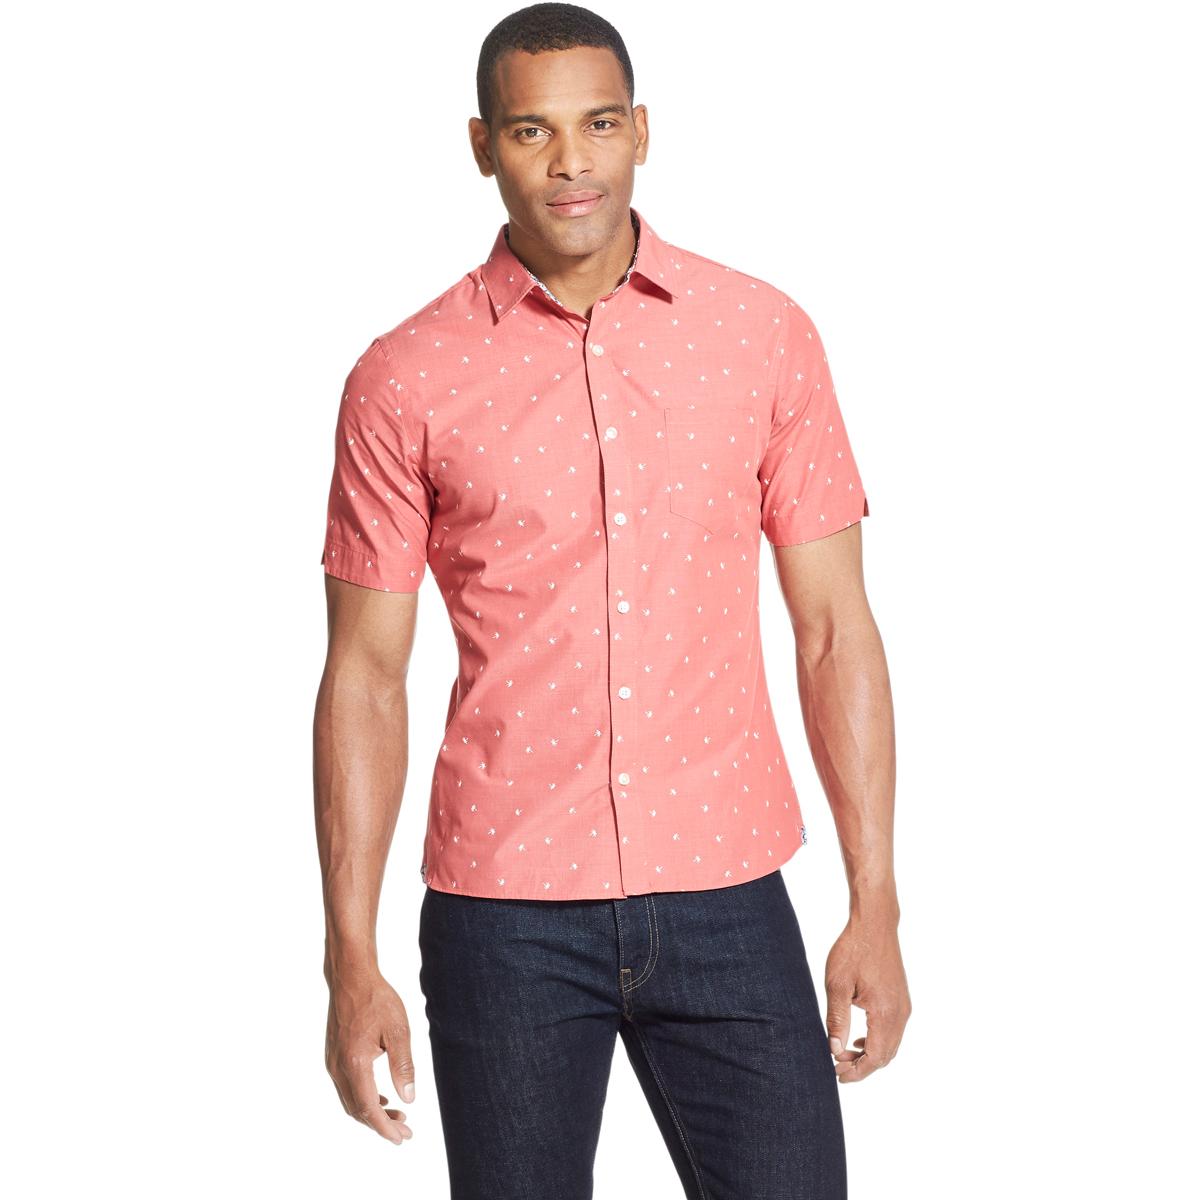 Van Heusen Men's Never Tuck Slim Fit Short-Sleeve Shirt - Red, L